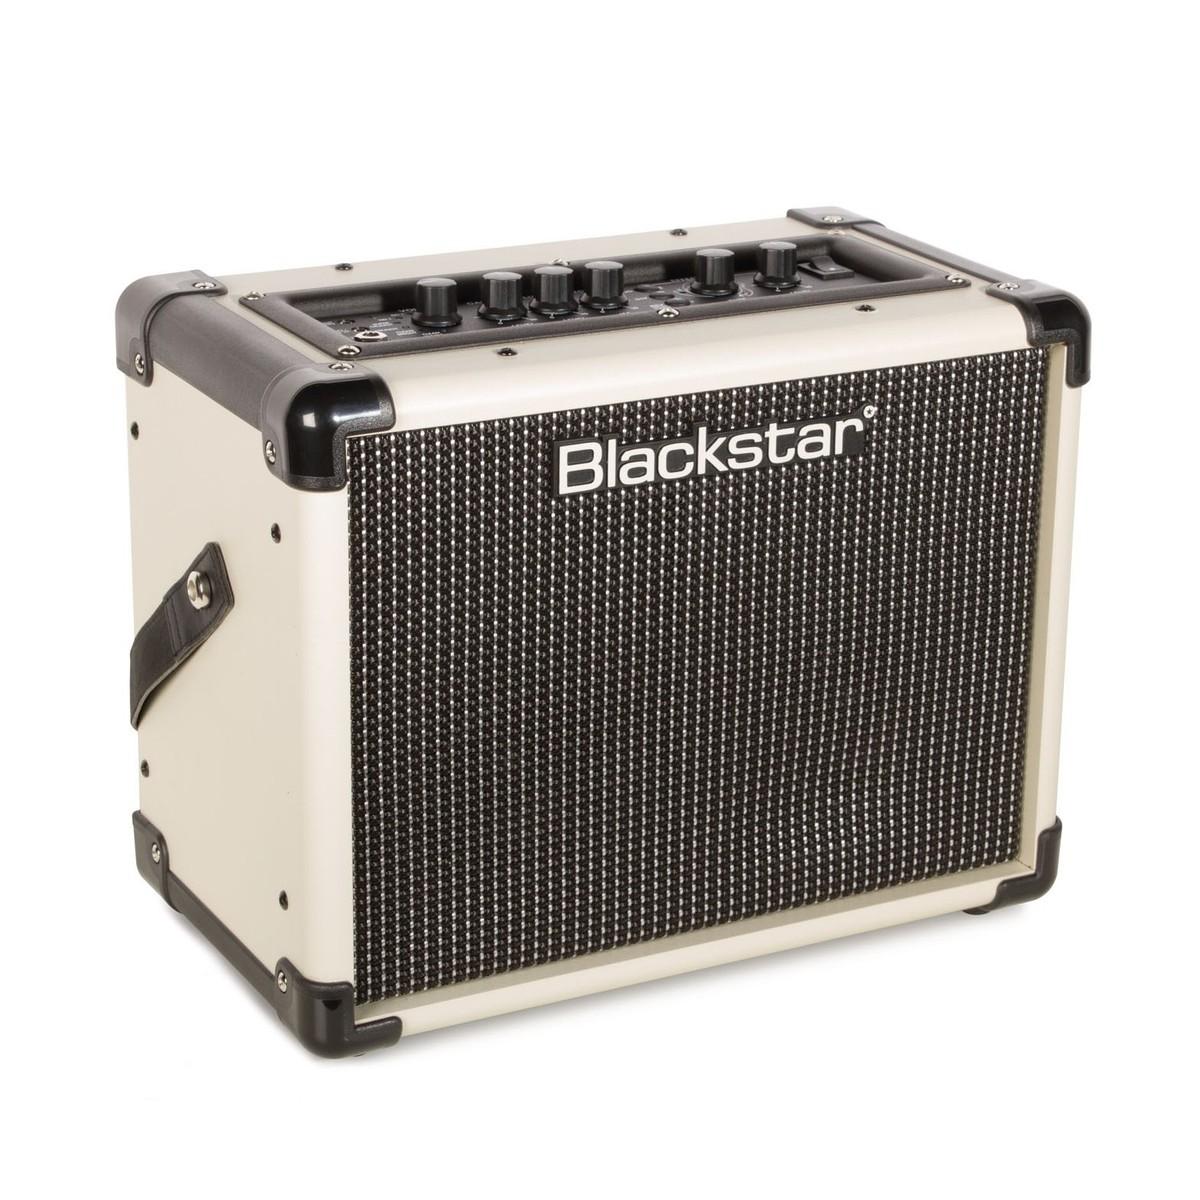 blackstar id core 10 stereo version 2 10 watt combo amp cream at. Black Bedroom Furniture Sets. Home Design Ideas